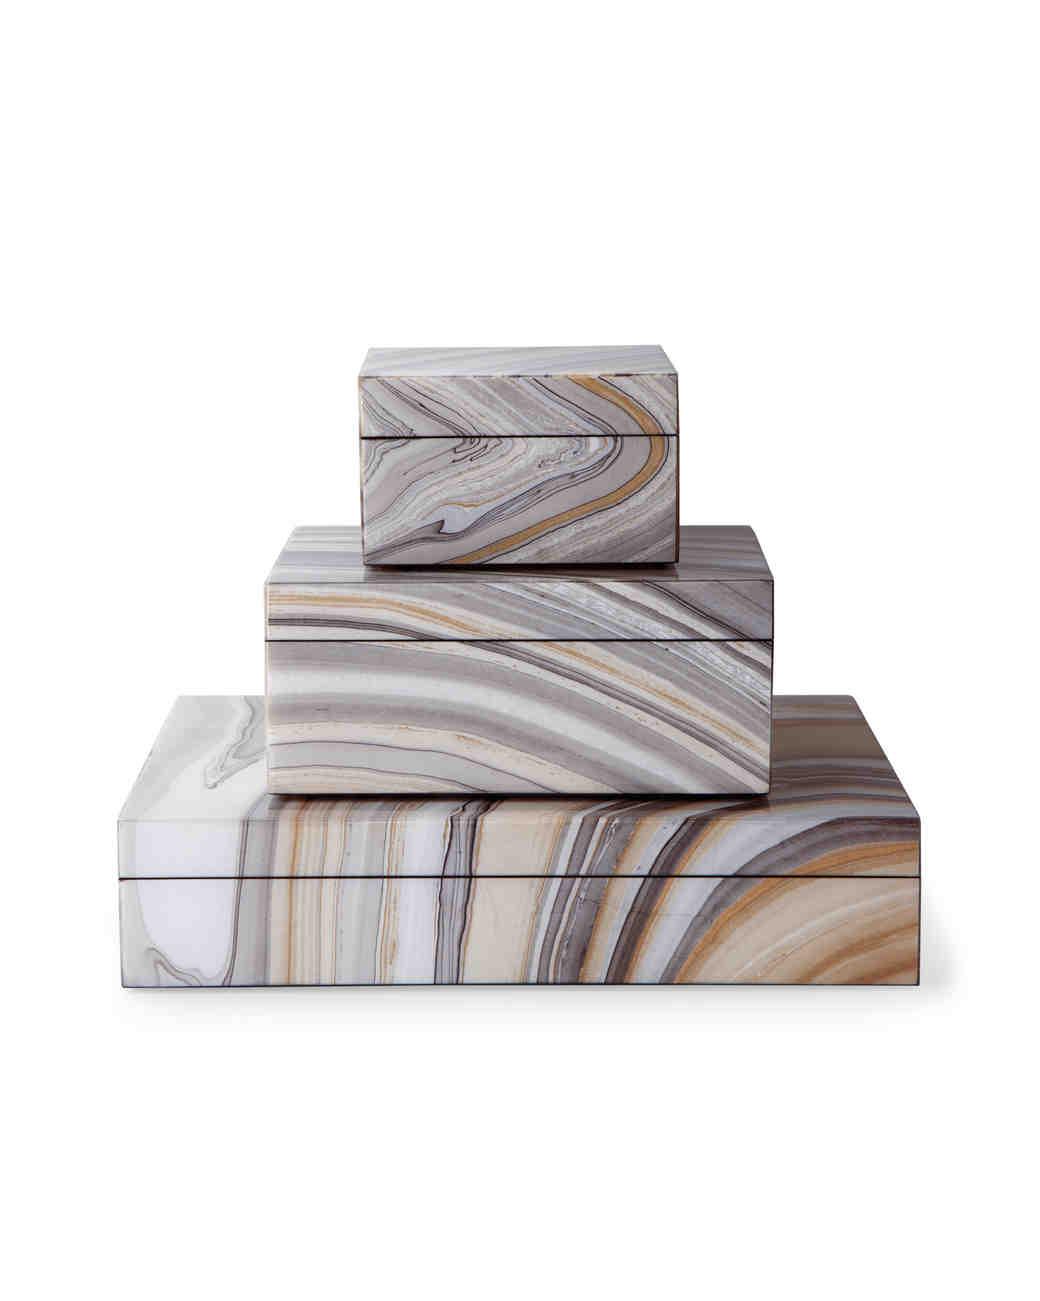 handmade-boxes-mwd108533.jpg